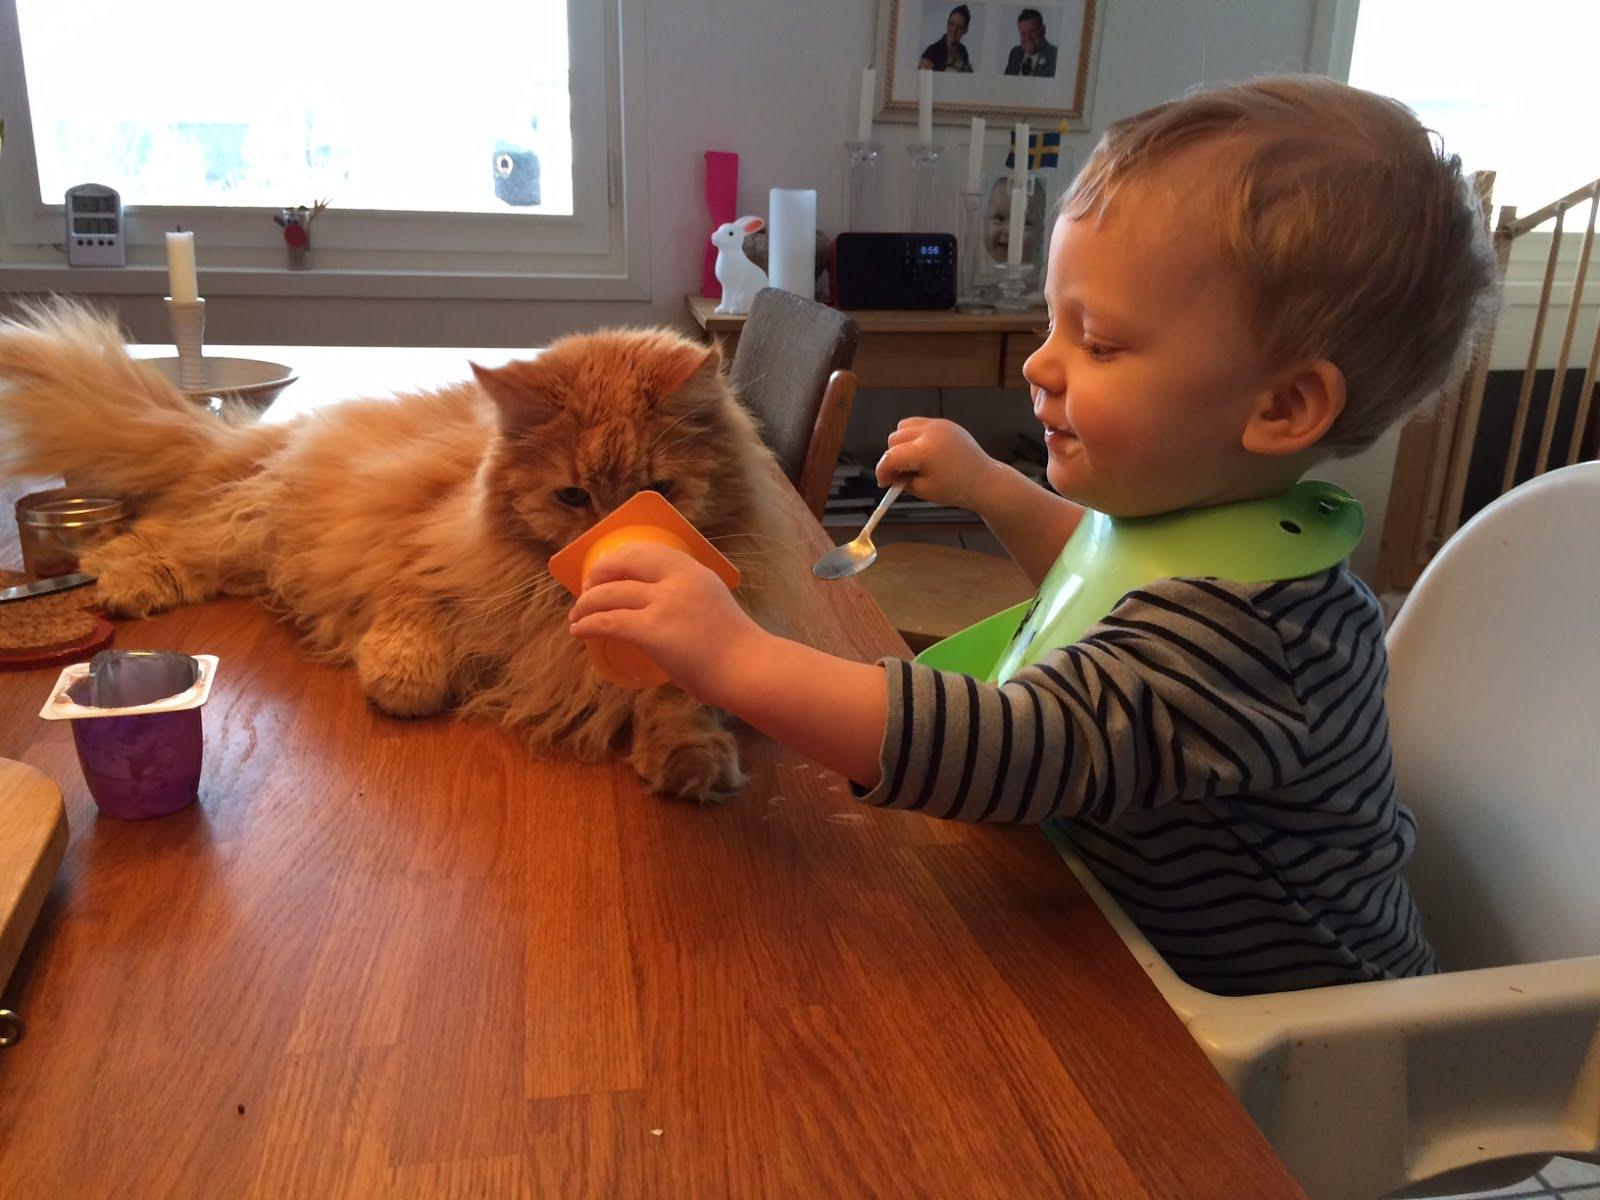 Zammy och sonen delar frukost